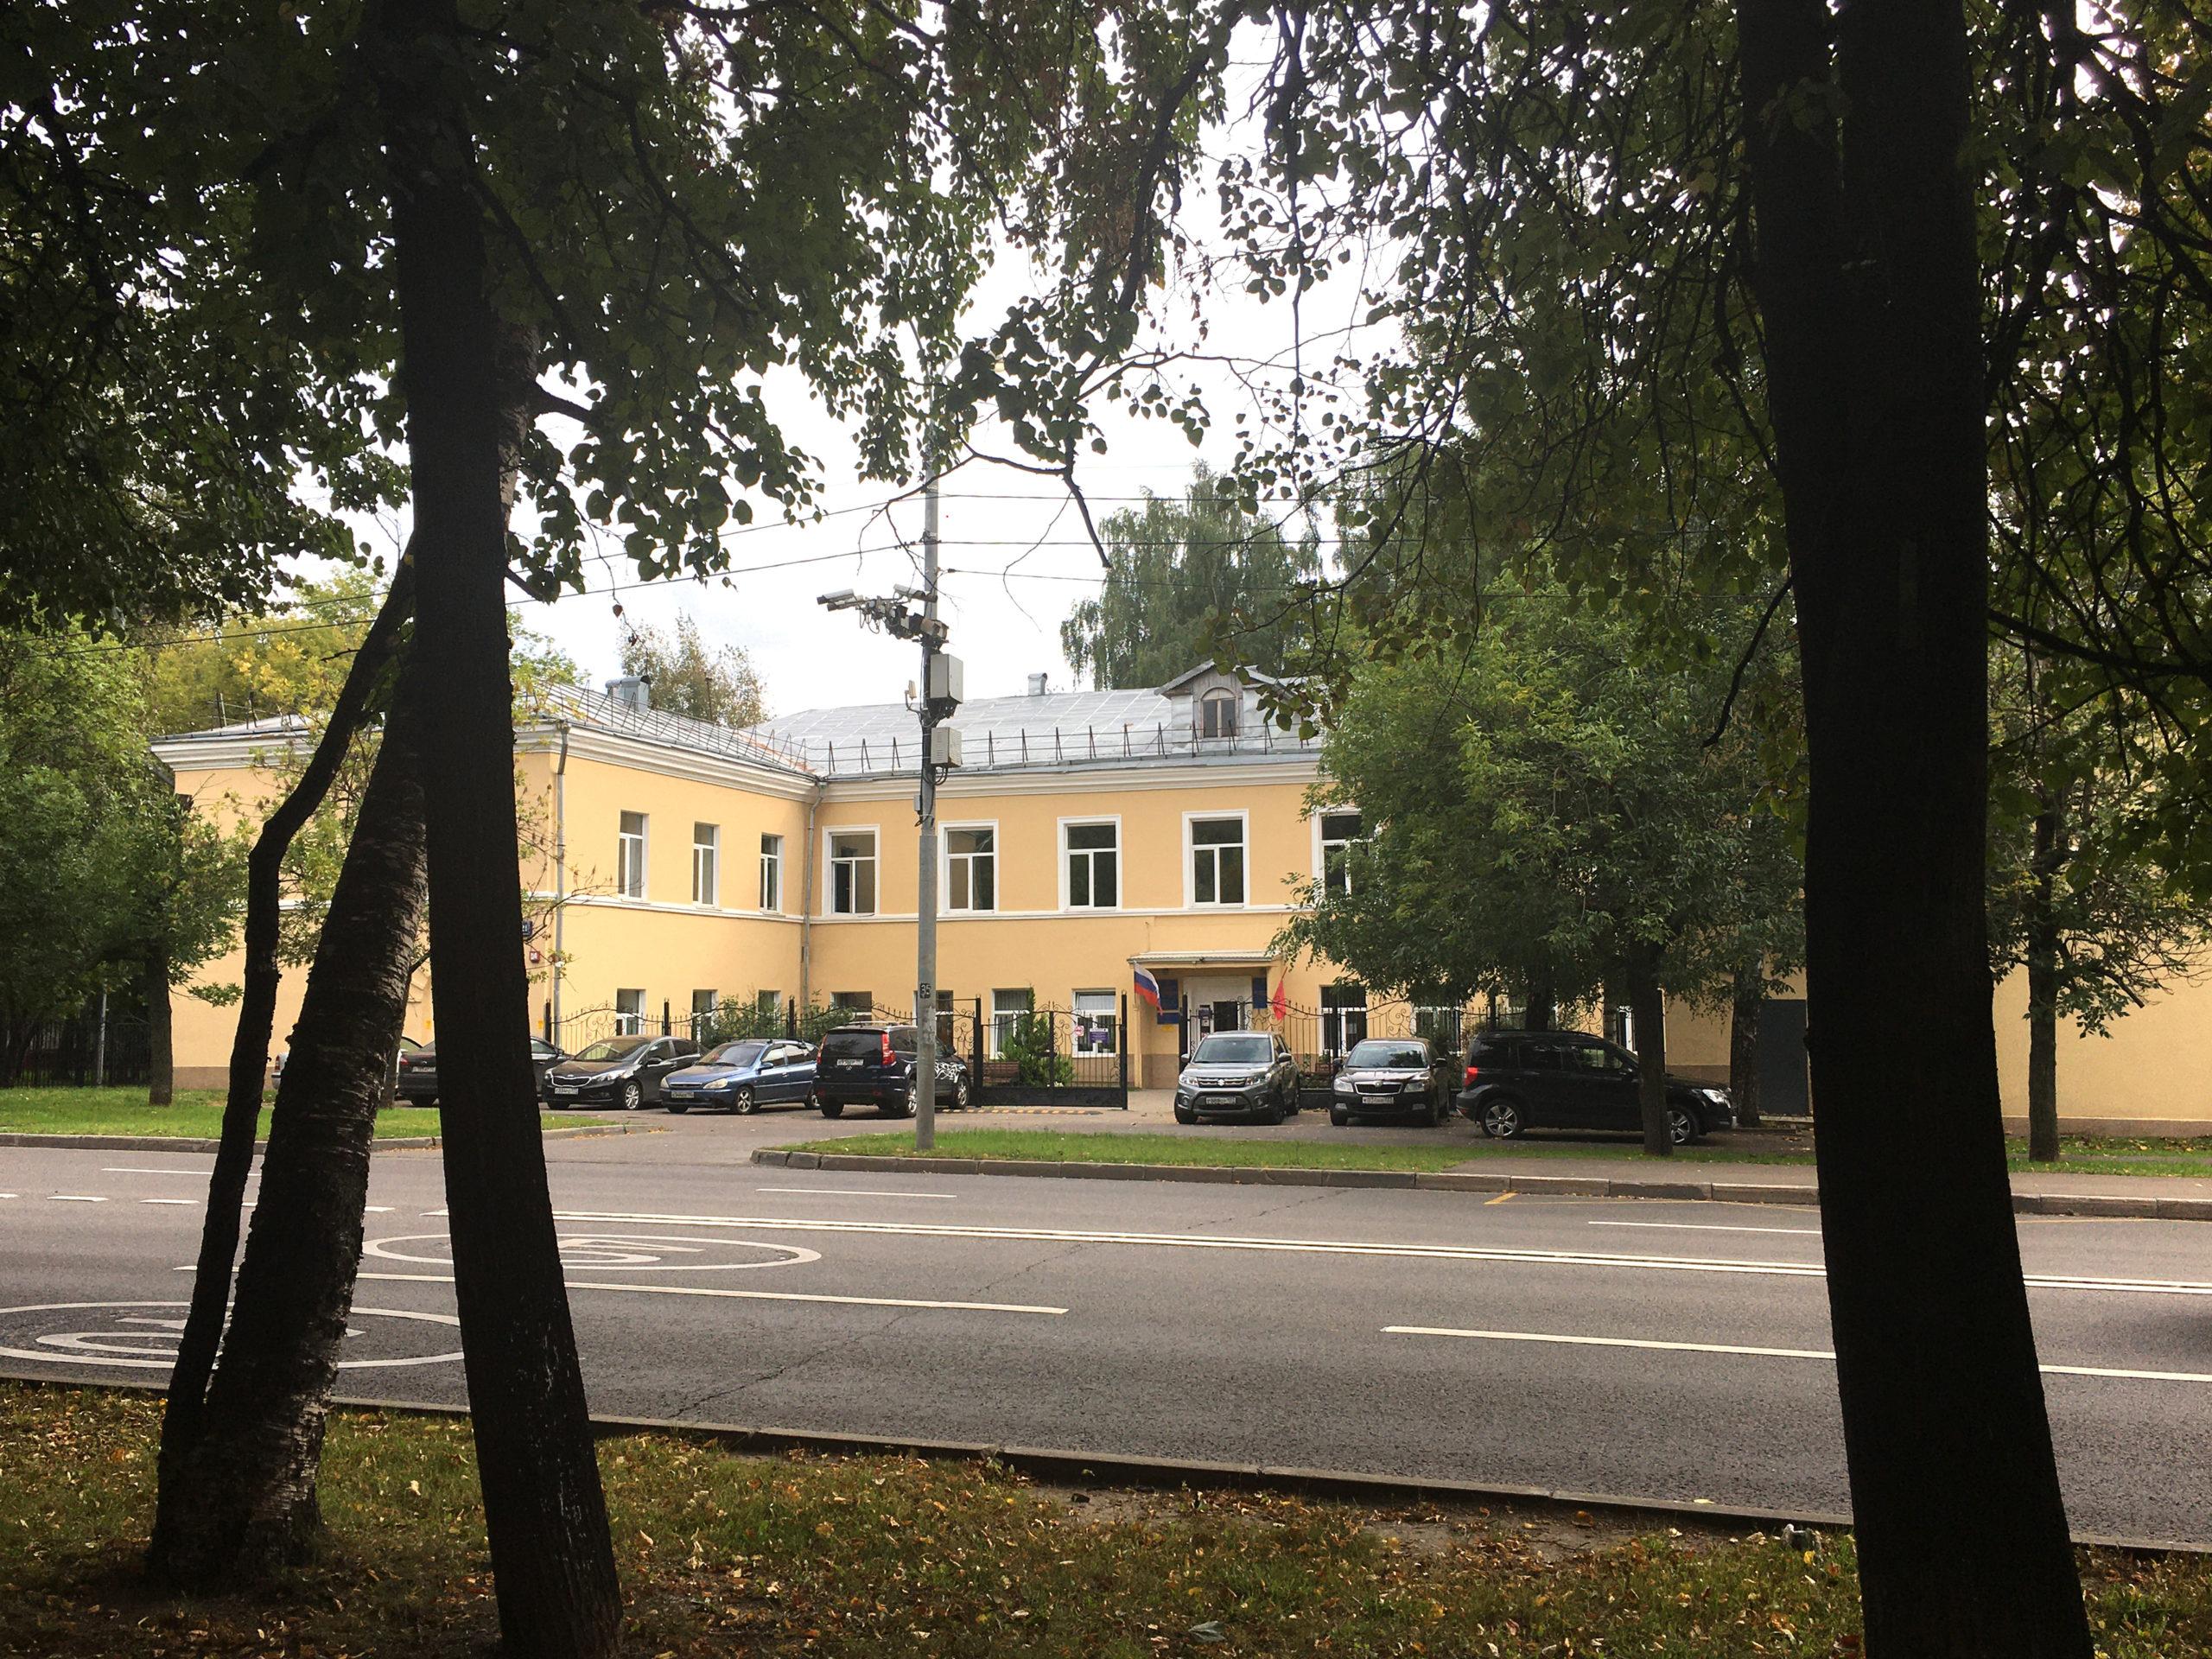 Департамент ИЗО, ДПИ и Дизайна переехал на улицу Фабрициуса, 21